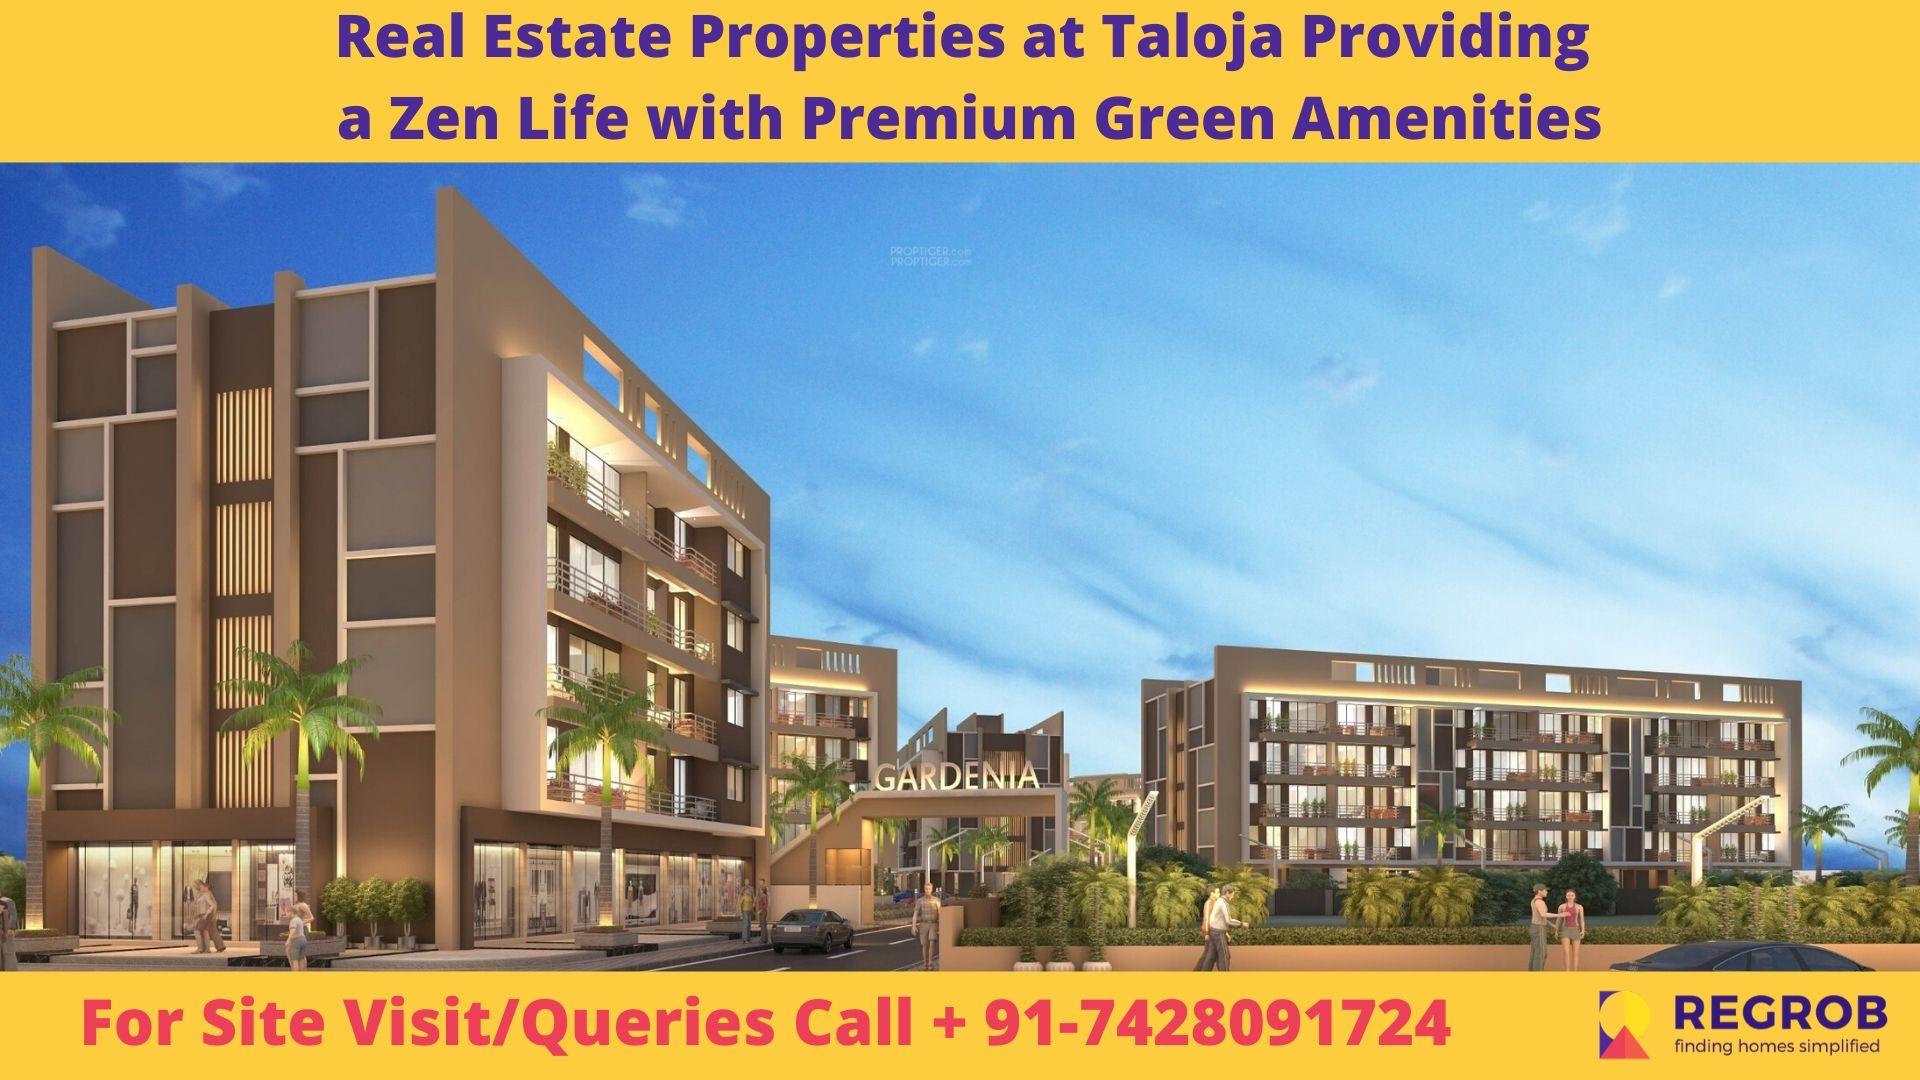 Real Estate Properties at Taloja Providing a Zen Life with Premium Green Amenities